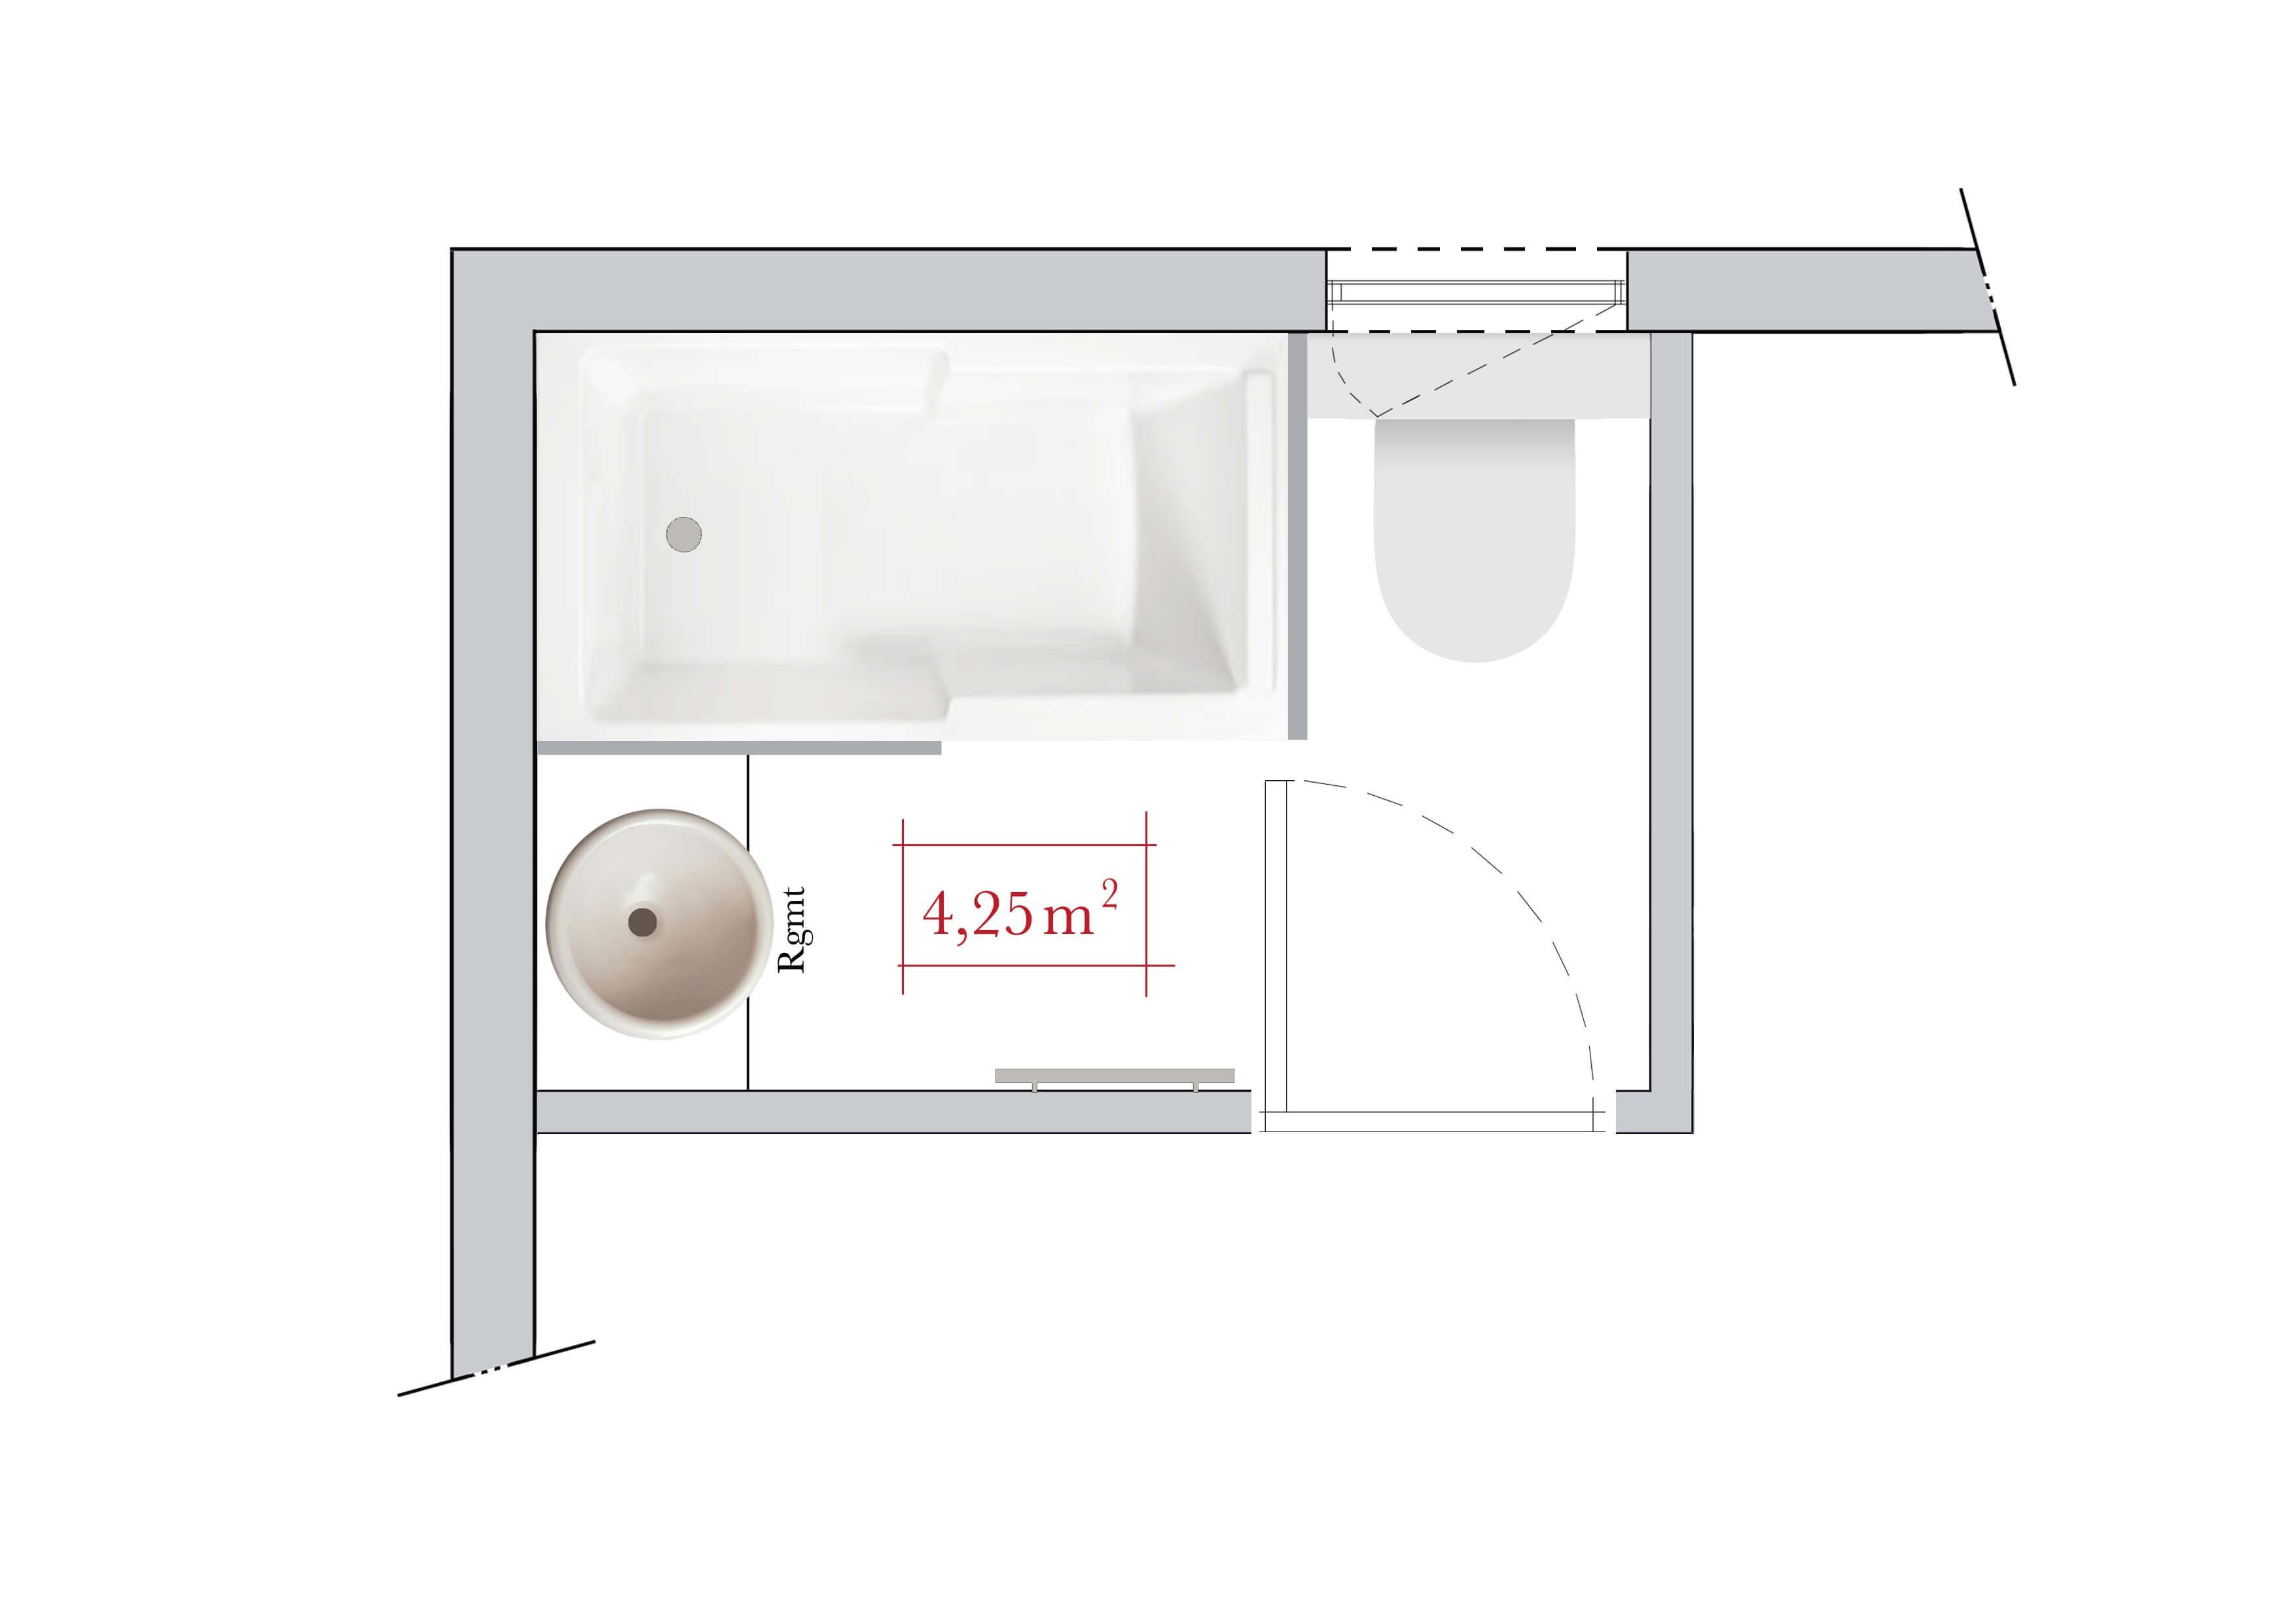 Plan agencement salle de bain 4m2